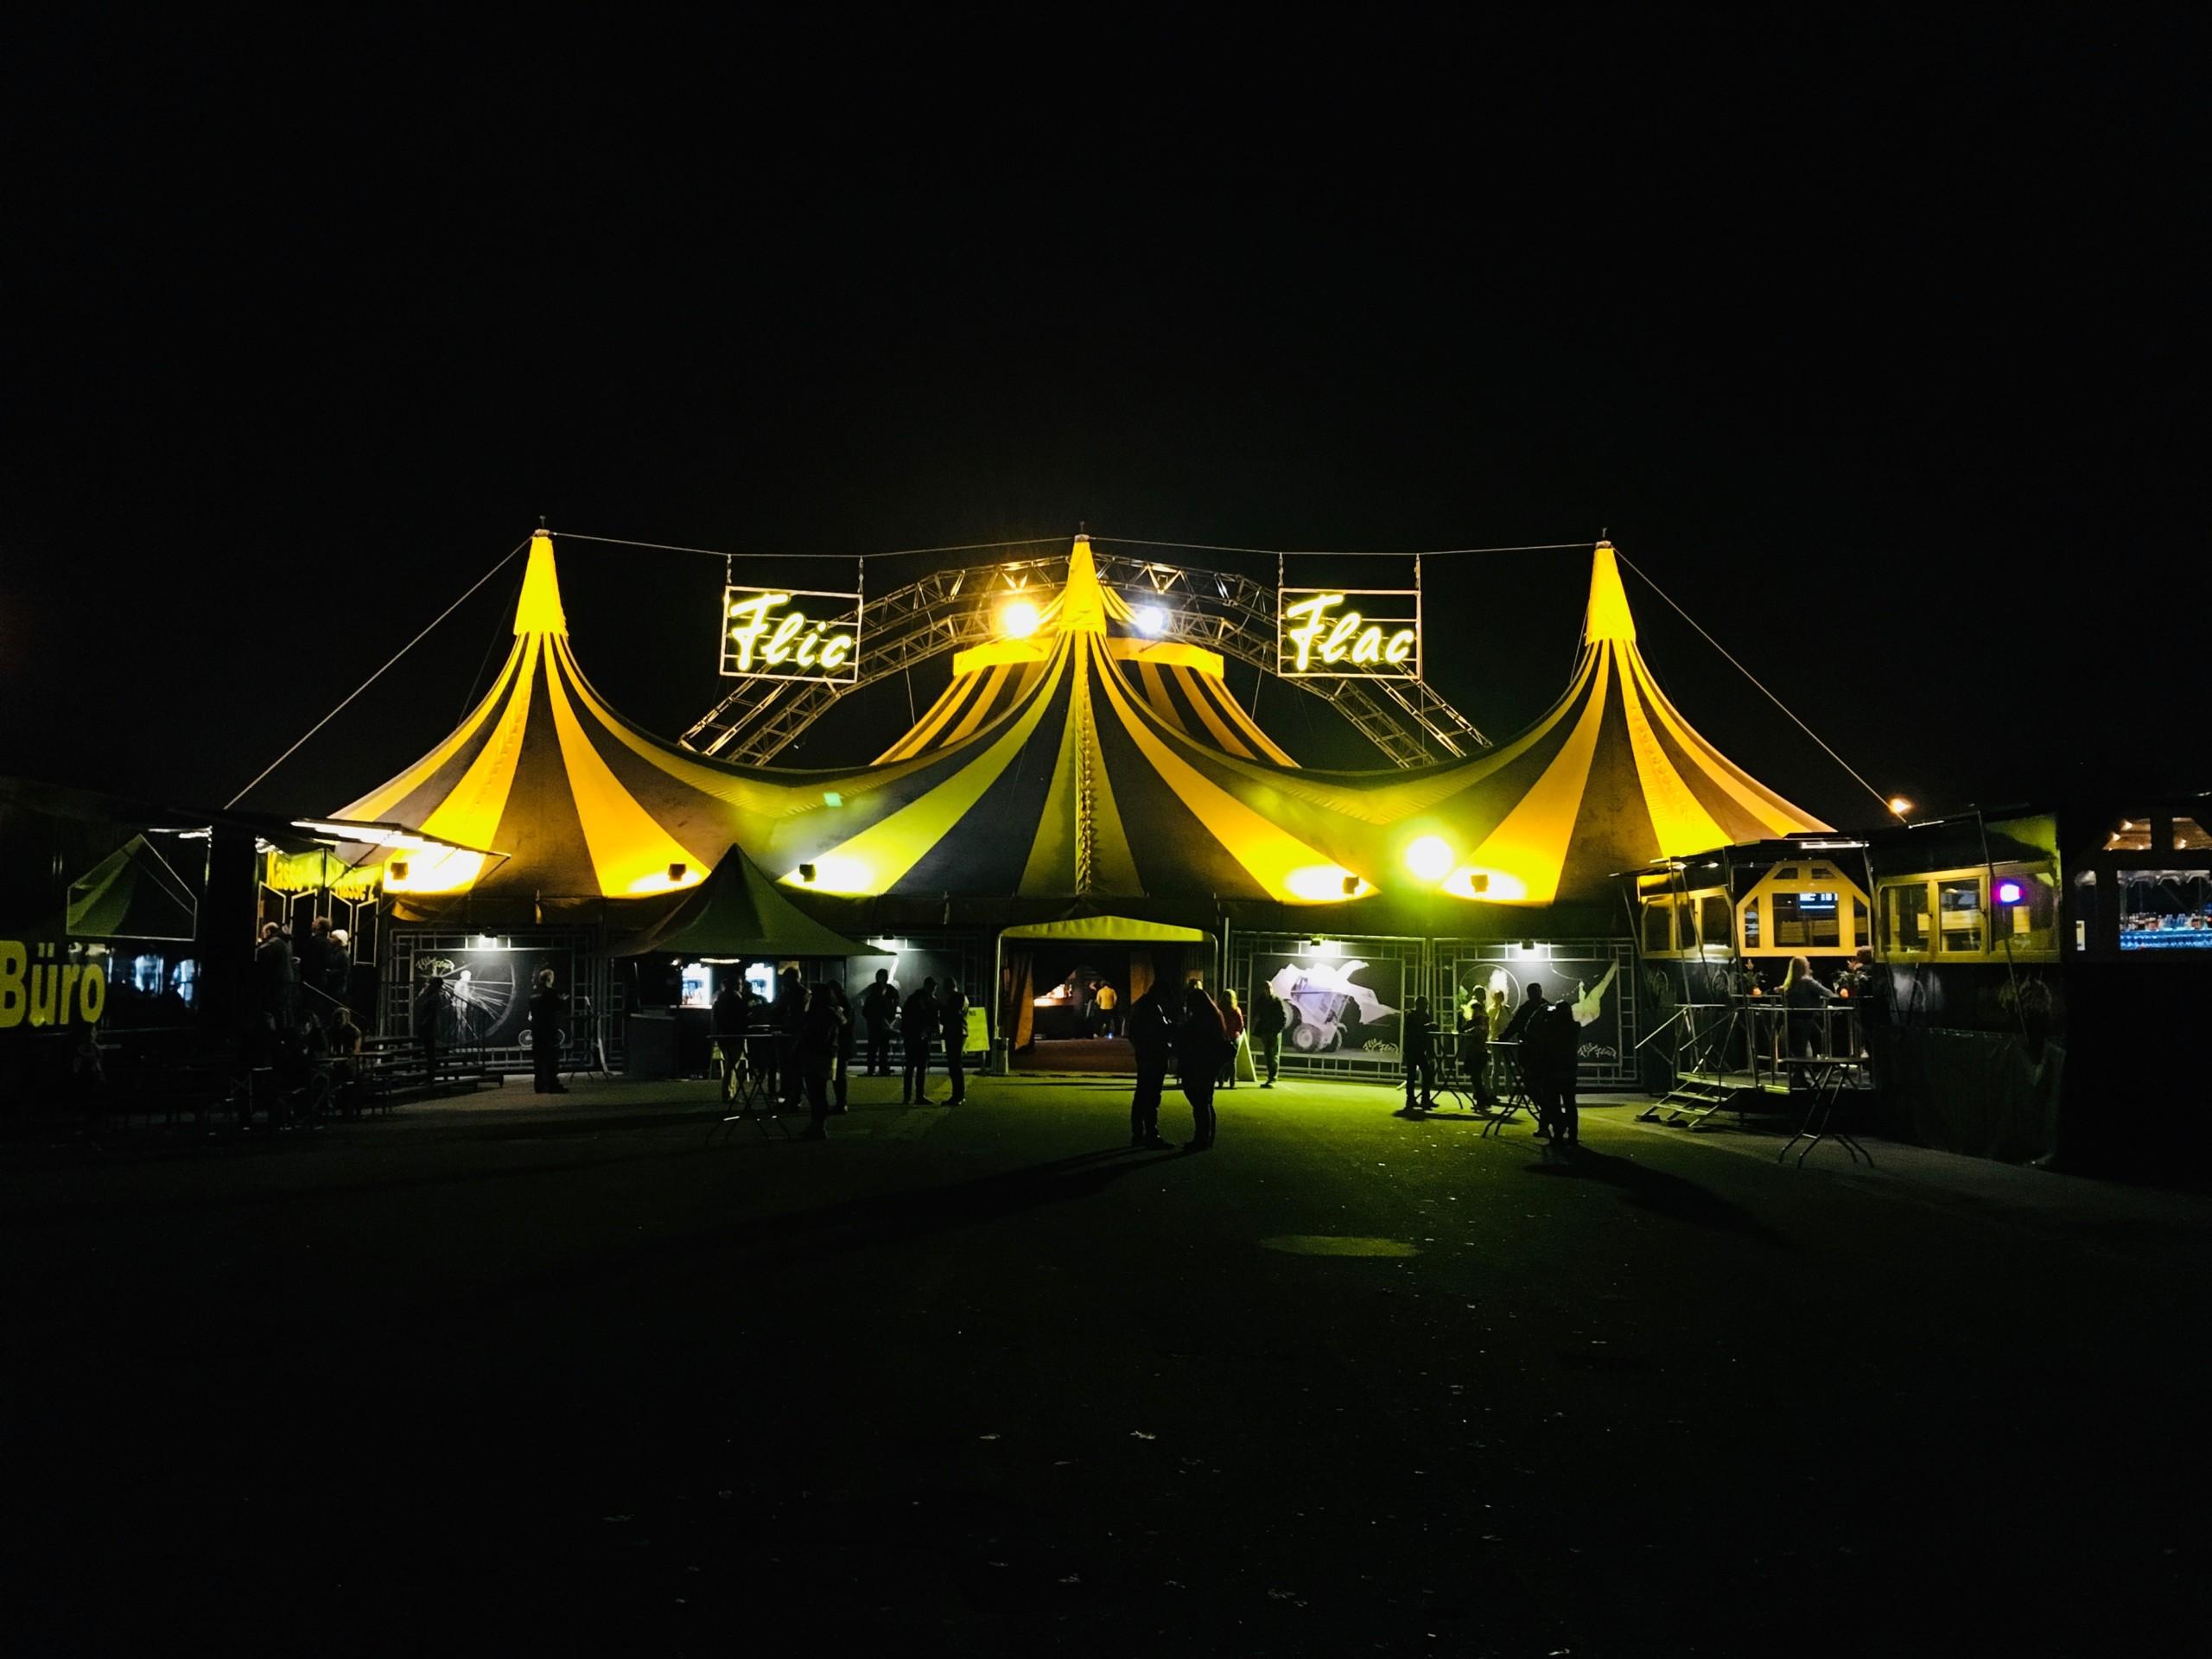 Circus FlicFlac